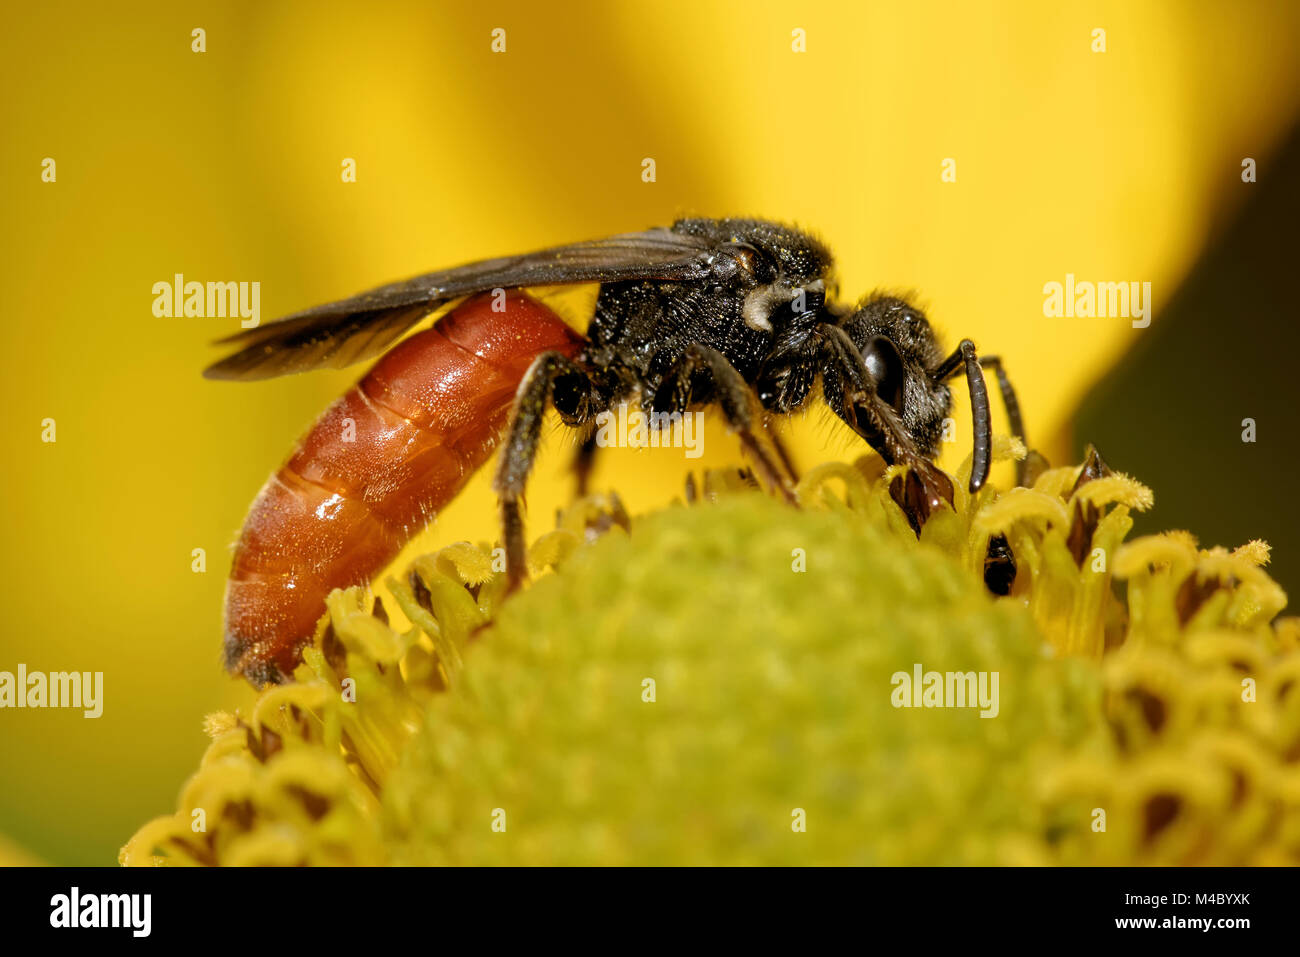 Sphecodes albilabris - Stock Image